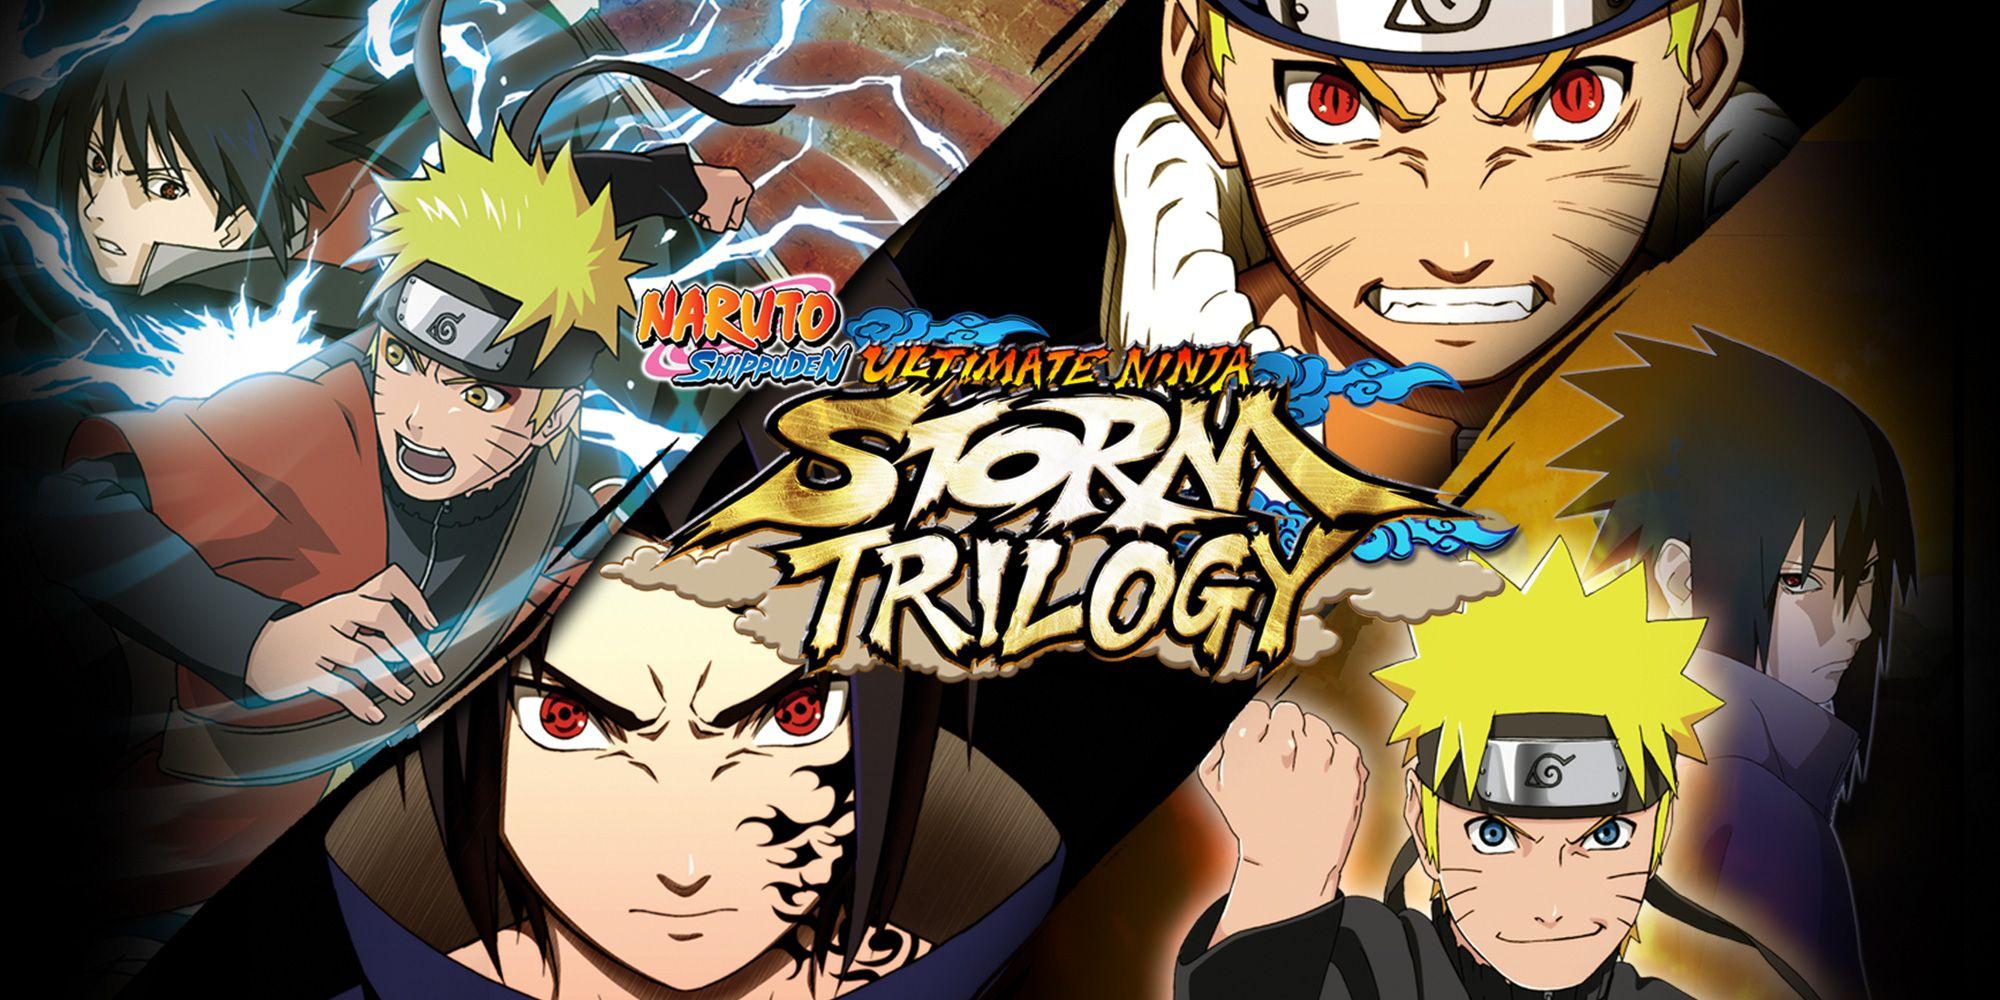 Naruto Shippuden: Ultimate Ninja Storm Trilogy (eshop)